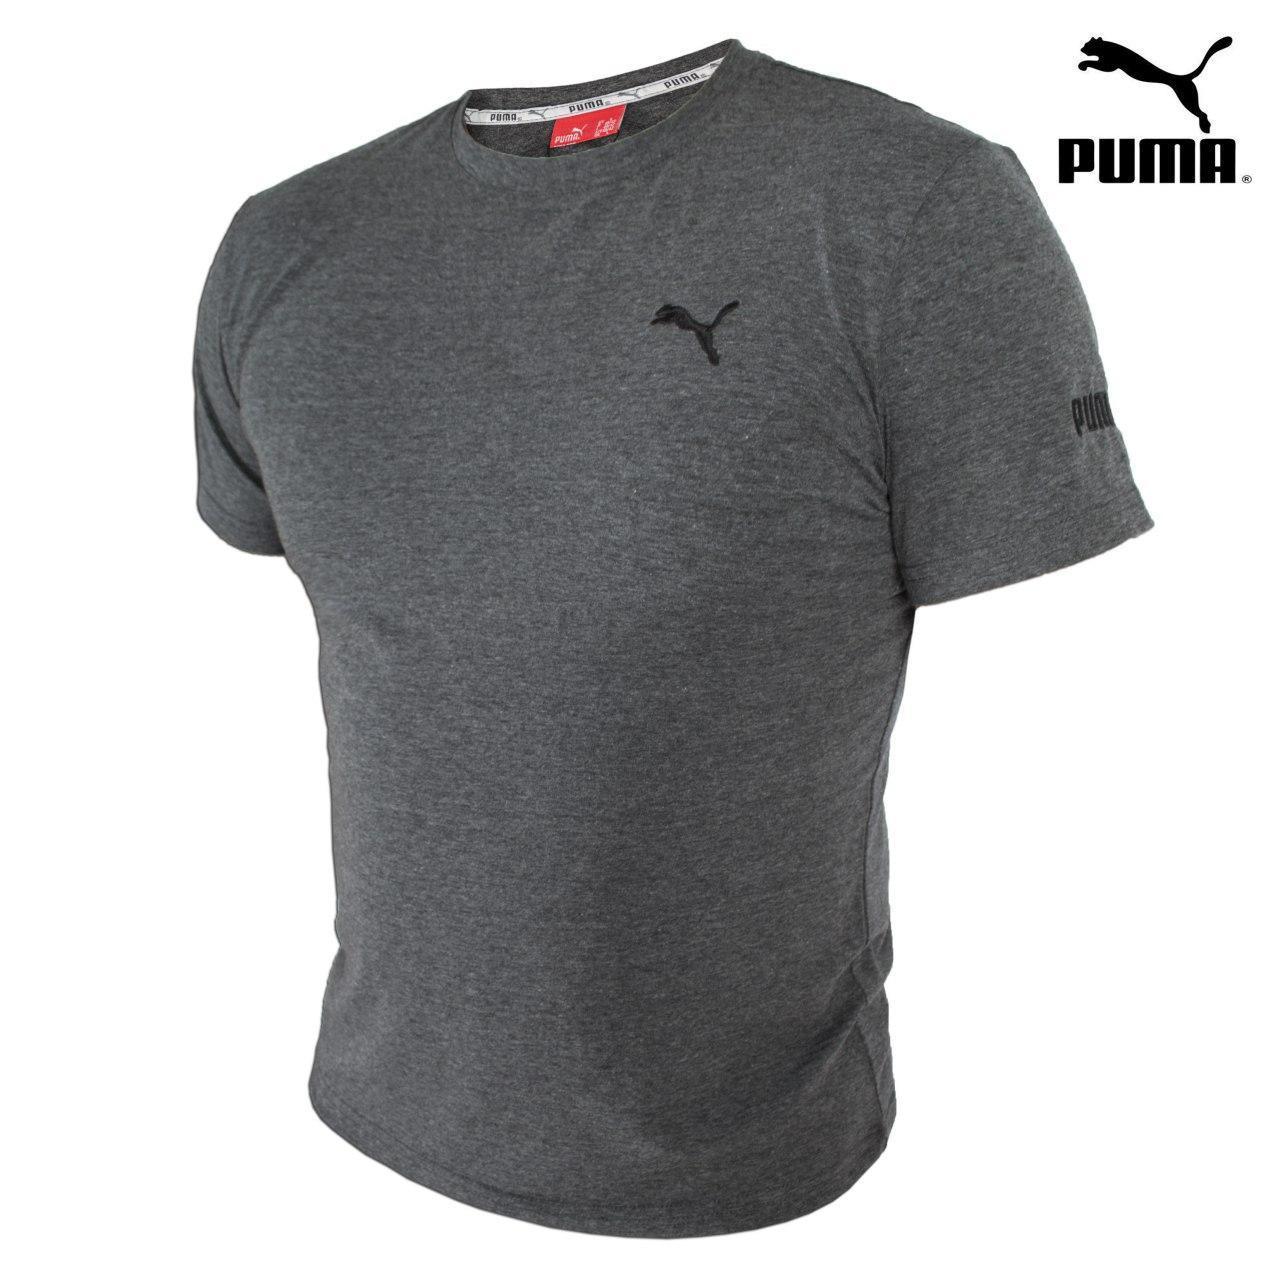 Футболка мужская реплика Puma